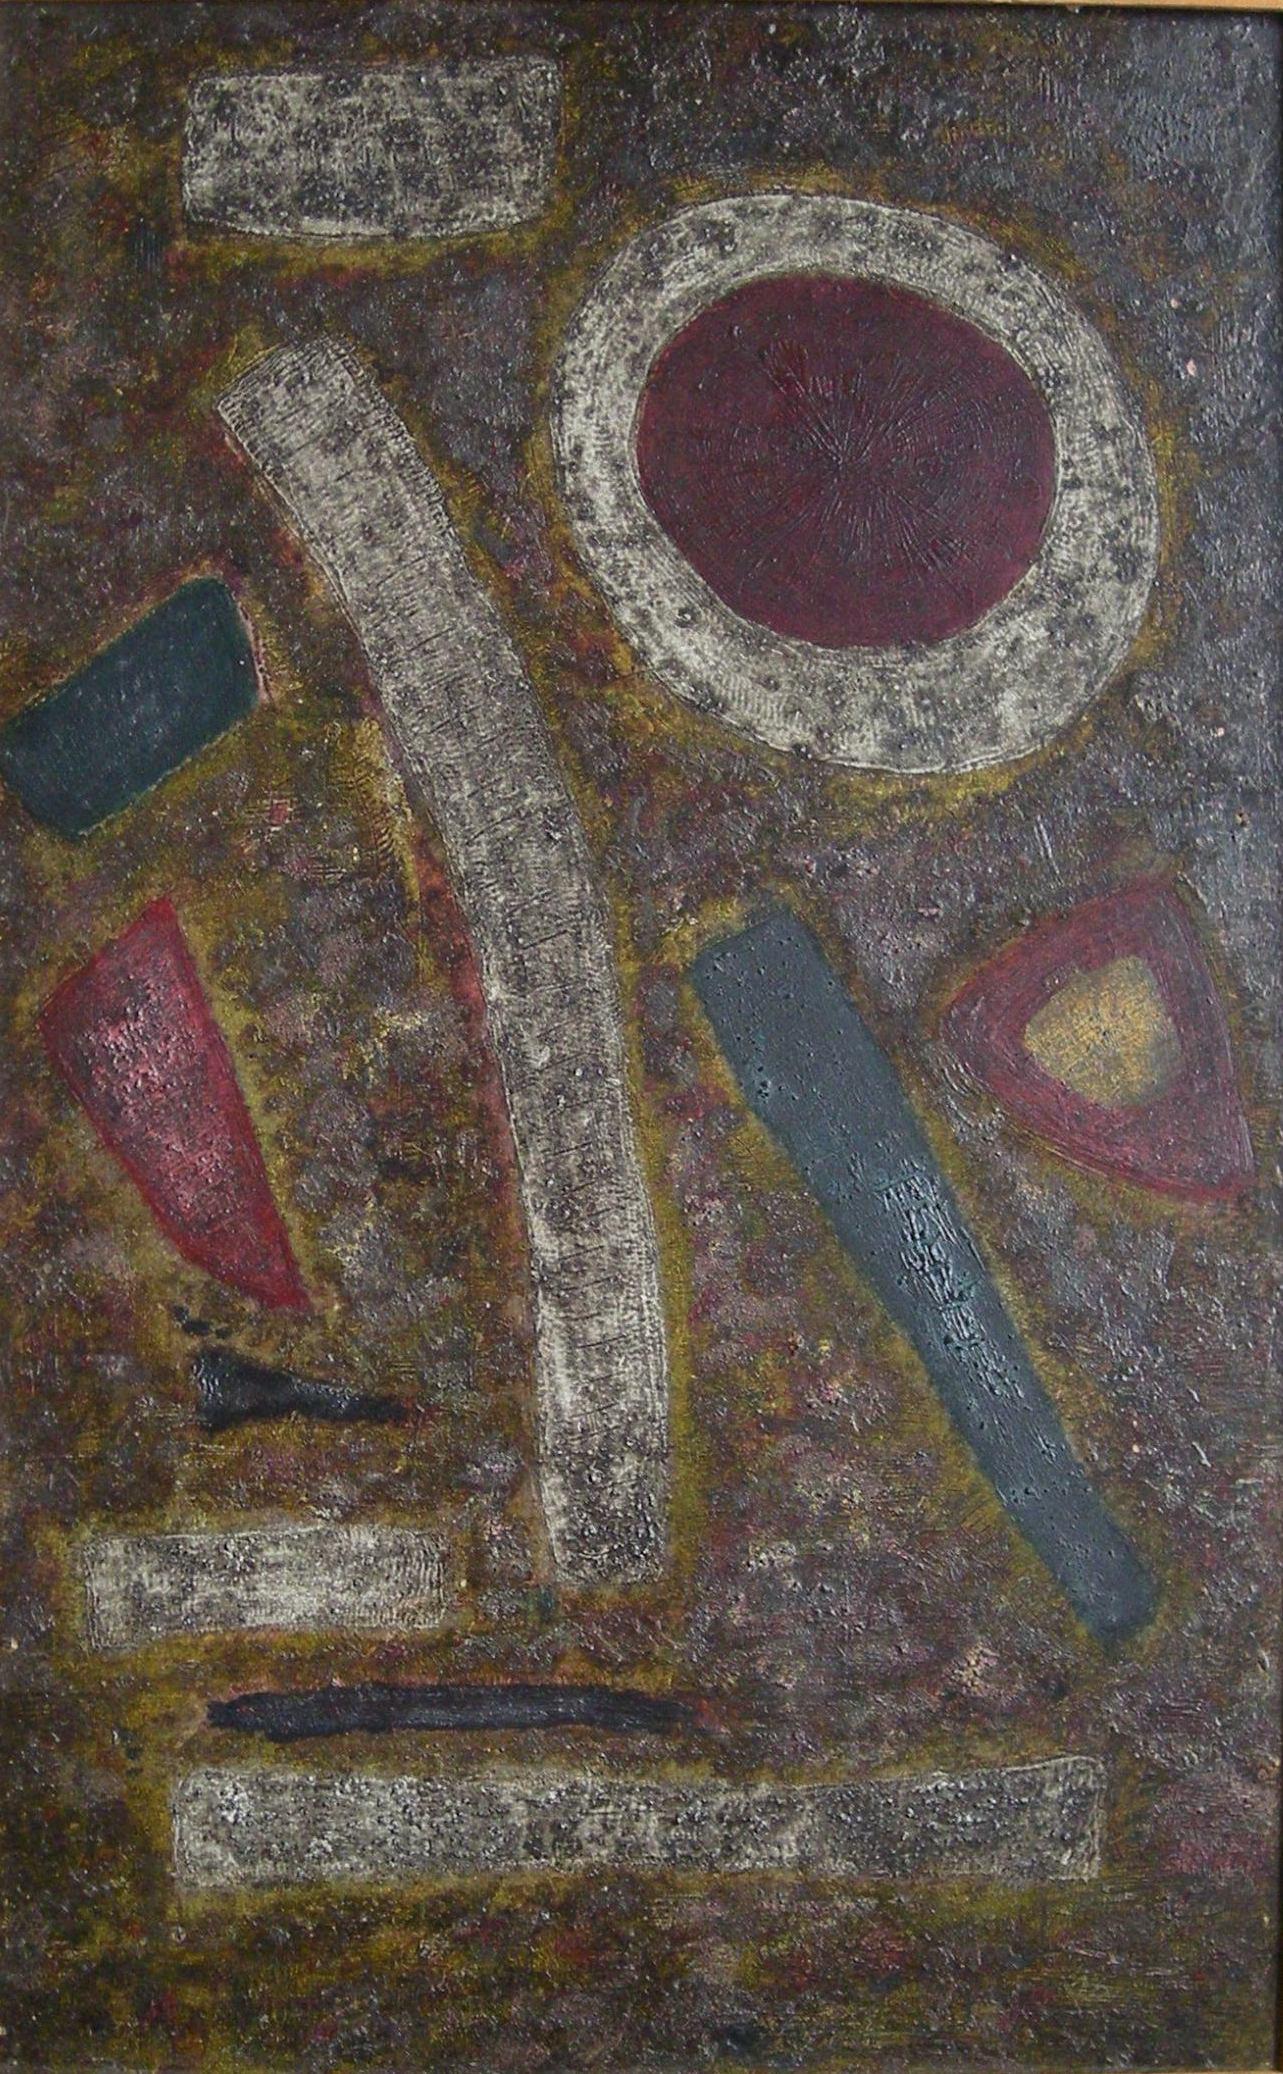 Christopherson 'Hieroglyph'